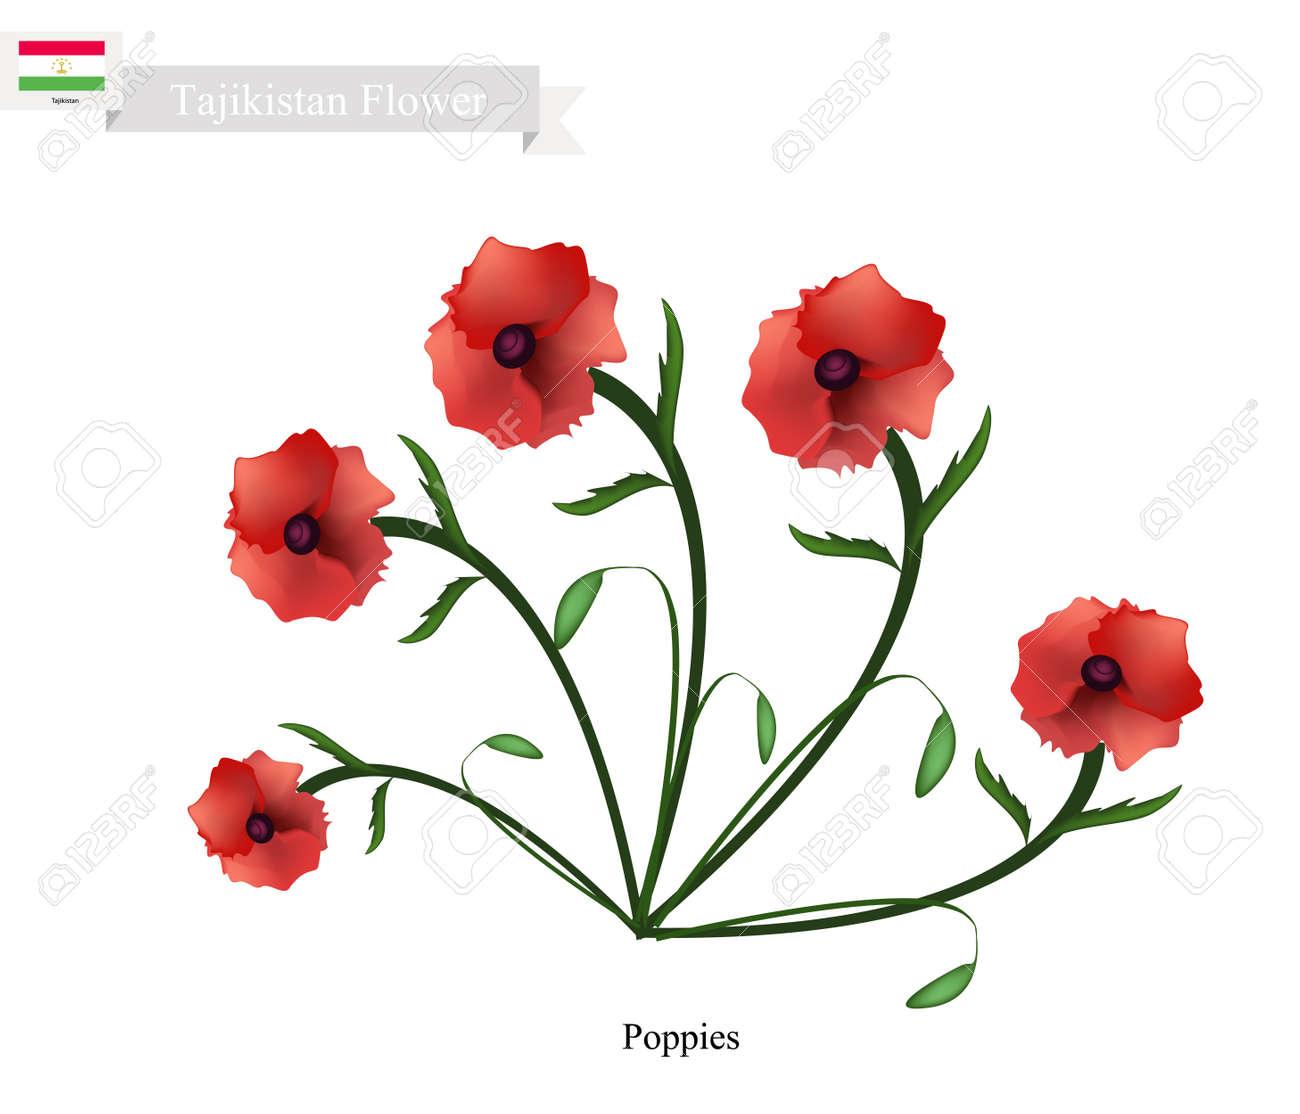 Tajikistan Flower Illustration Of Red Poppy Flowers One Of